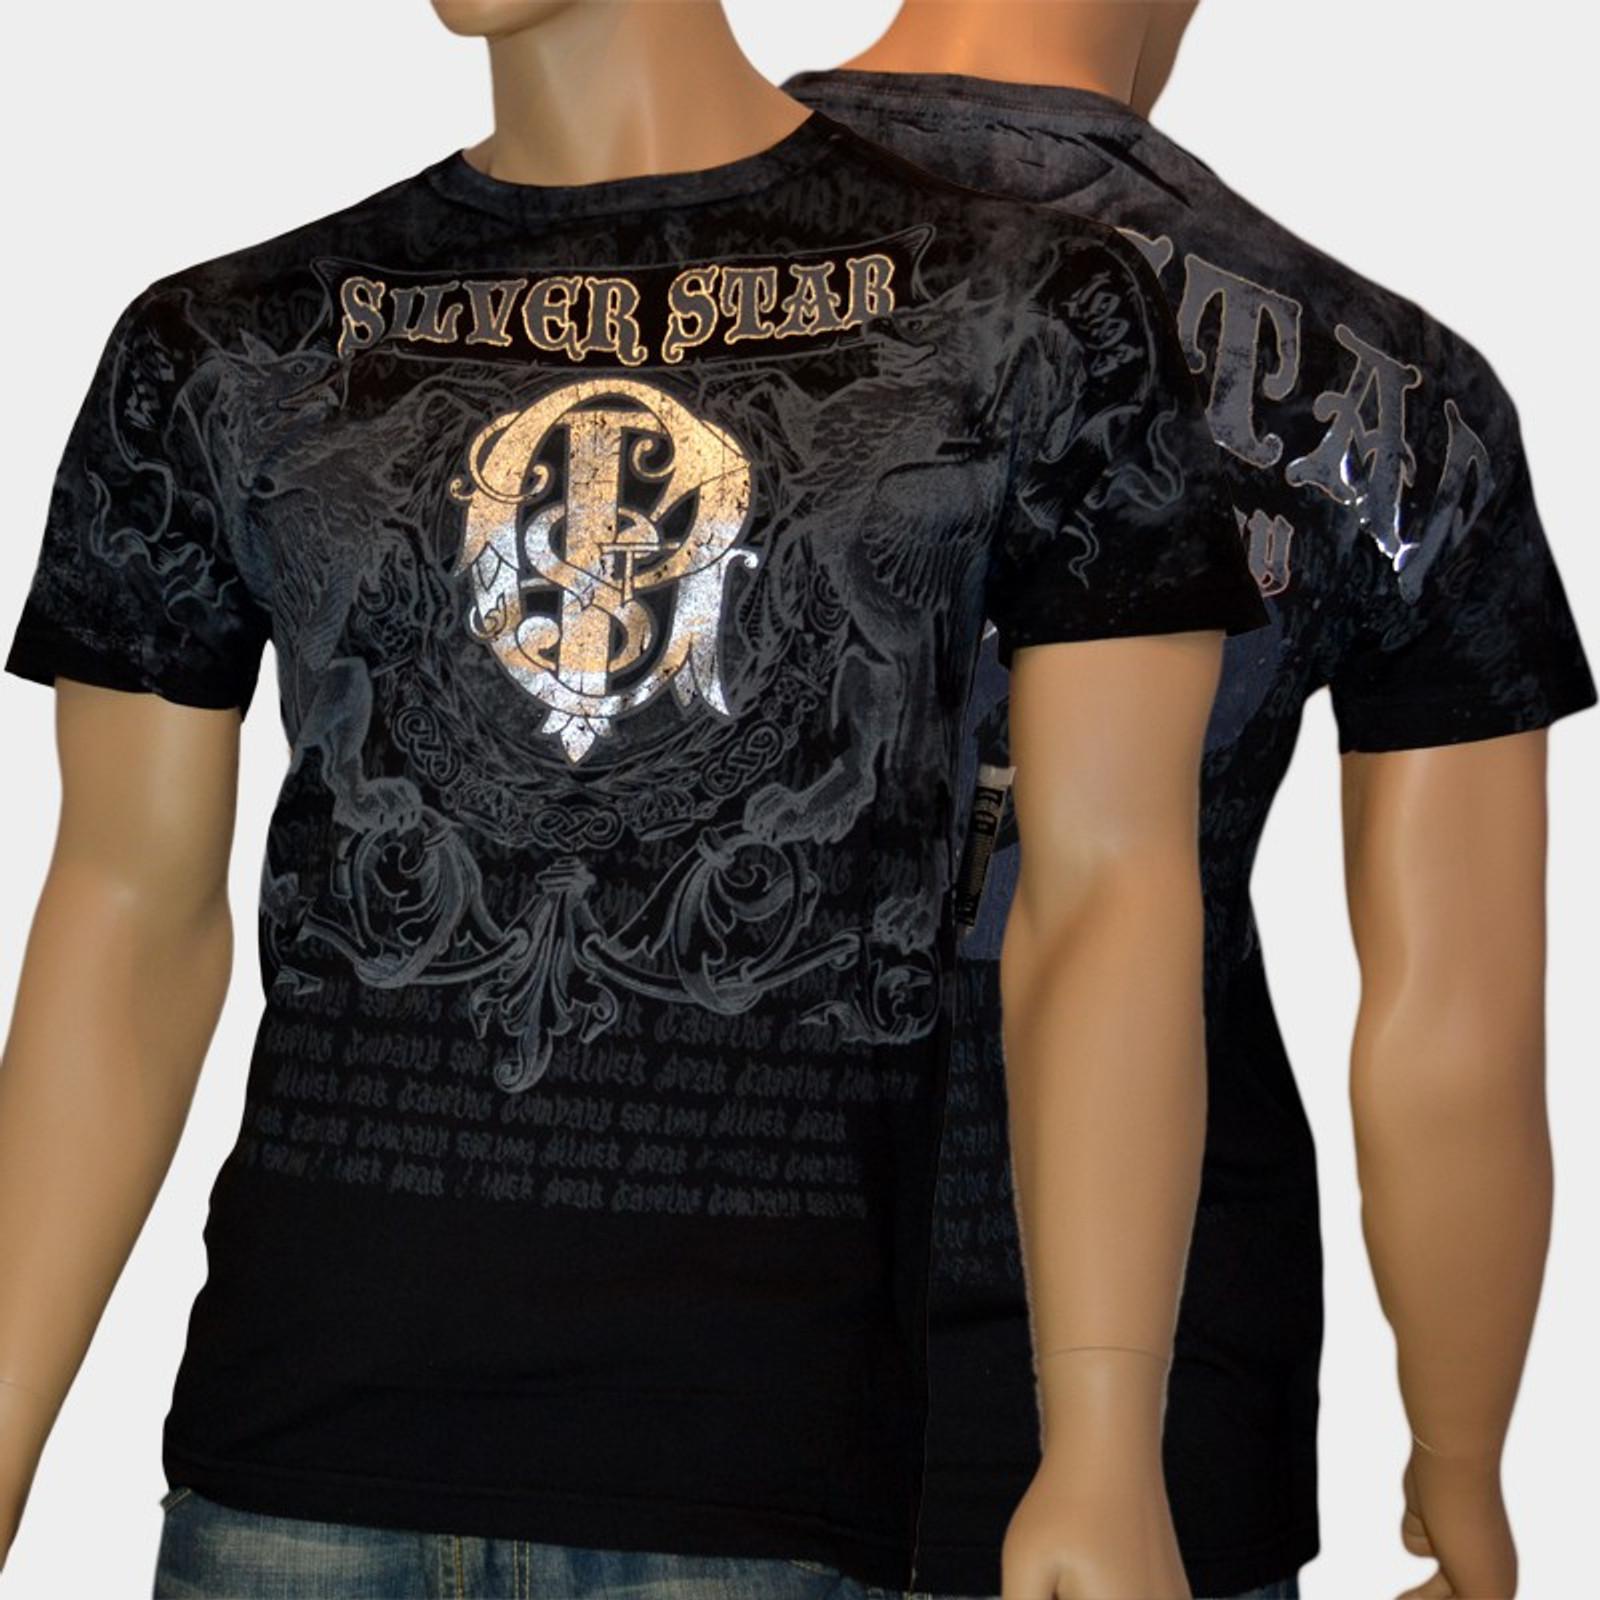 Silver Star T-Shirt Royalty